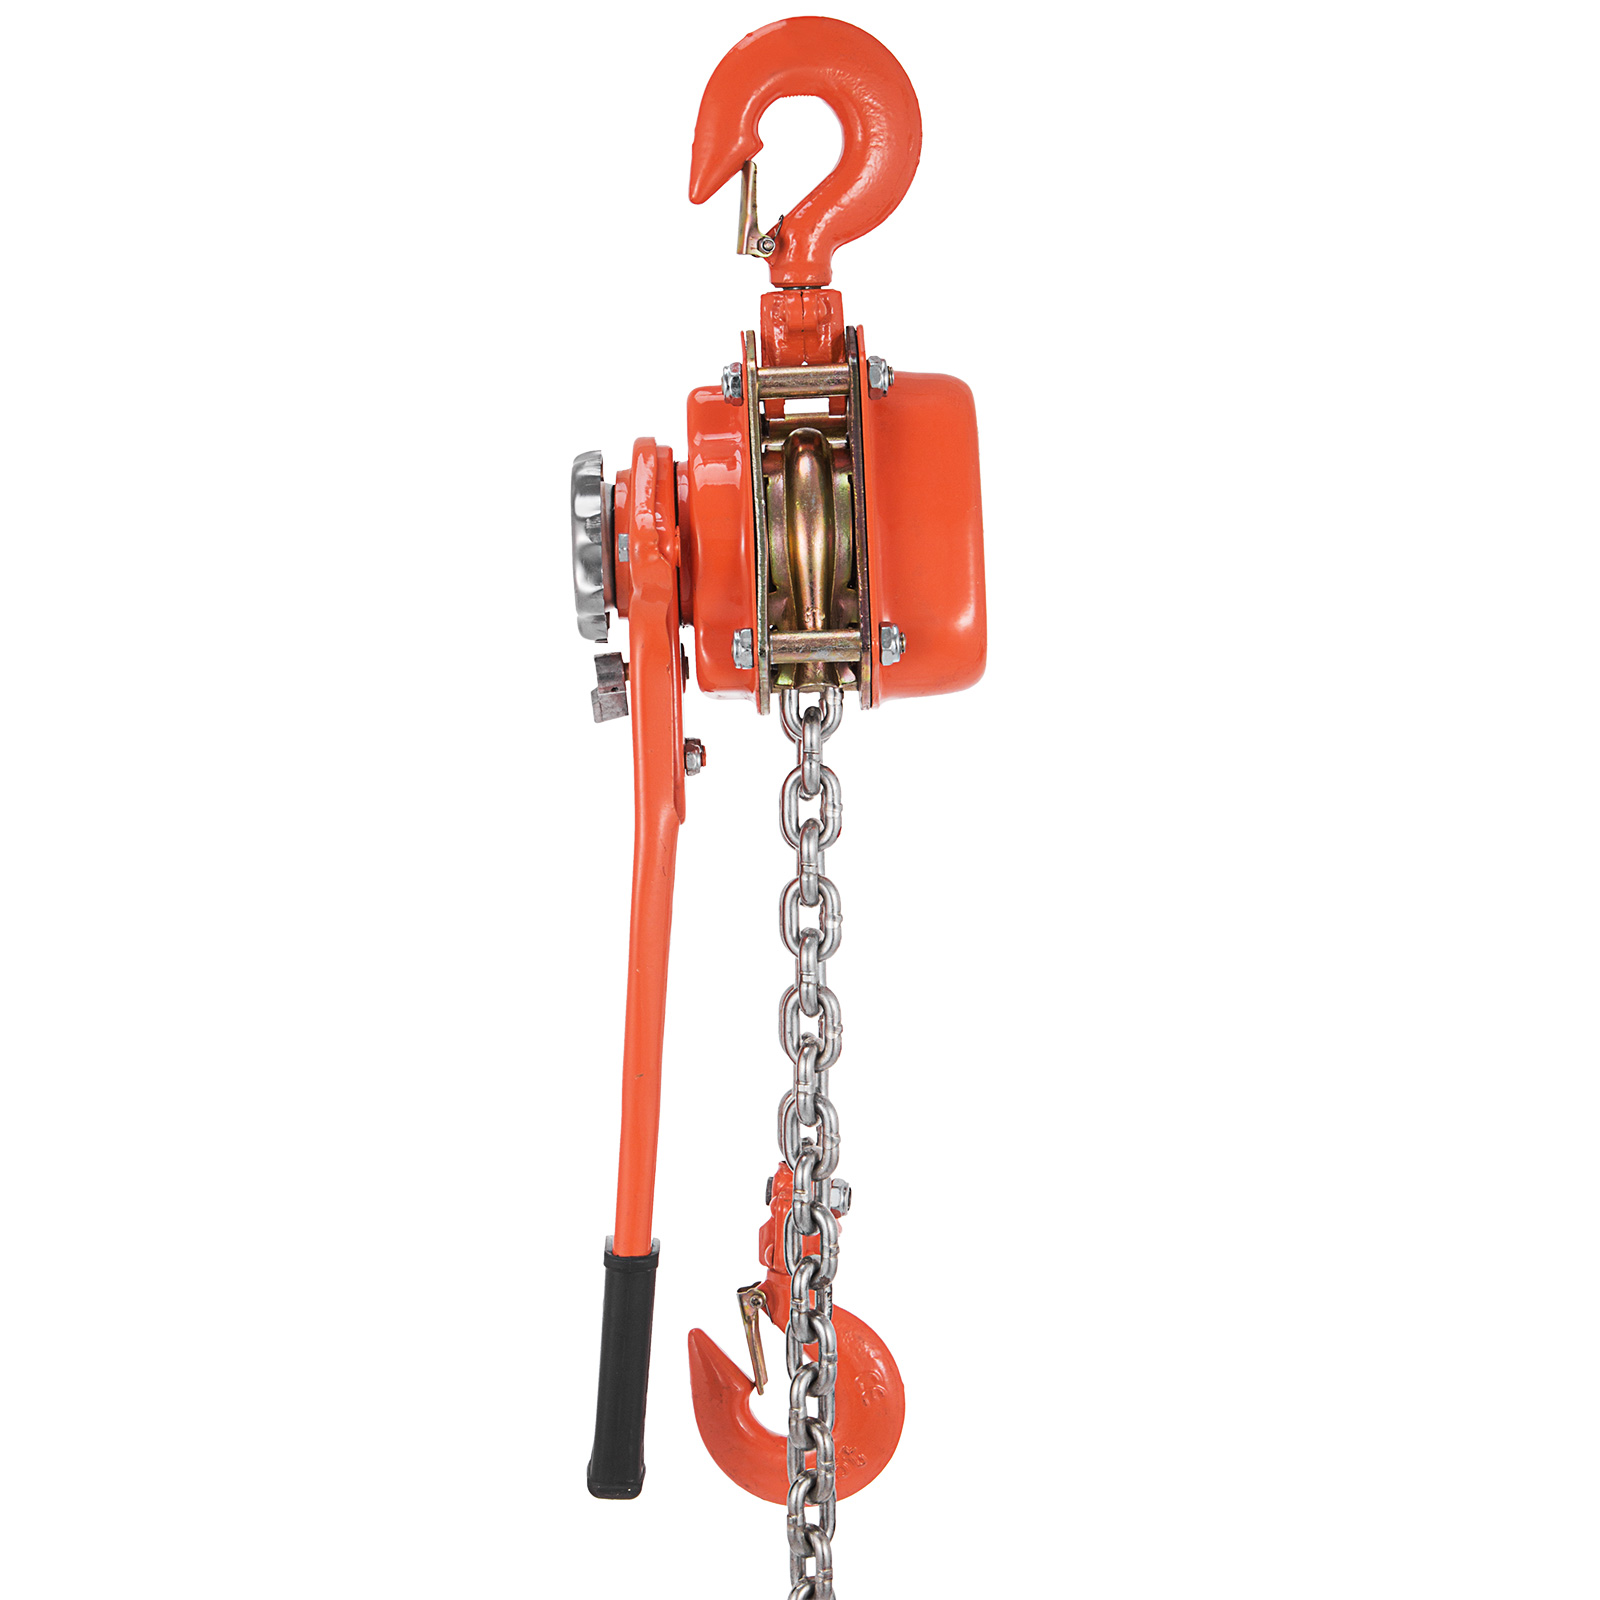 1-5T-Lever-Block-Chain-Hoist-1-5M-6M-Lift-Pull-Machinery-Gear-FACTORY-DISCOUNT thumbnail 29